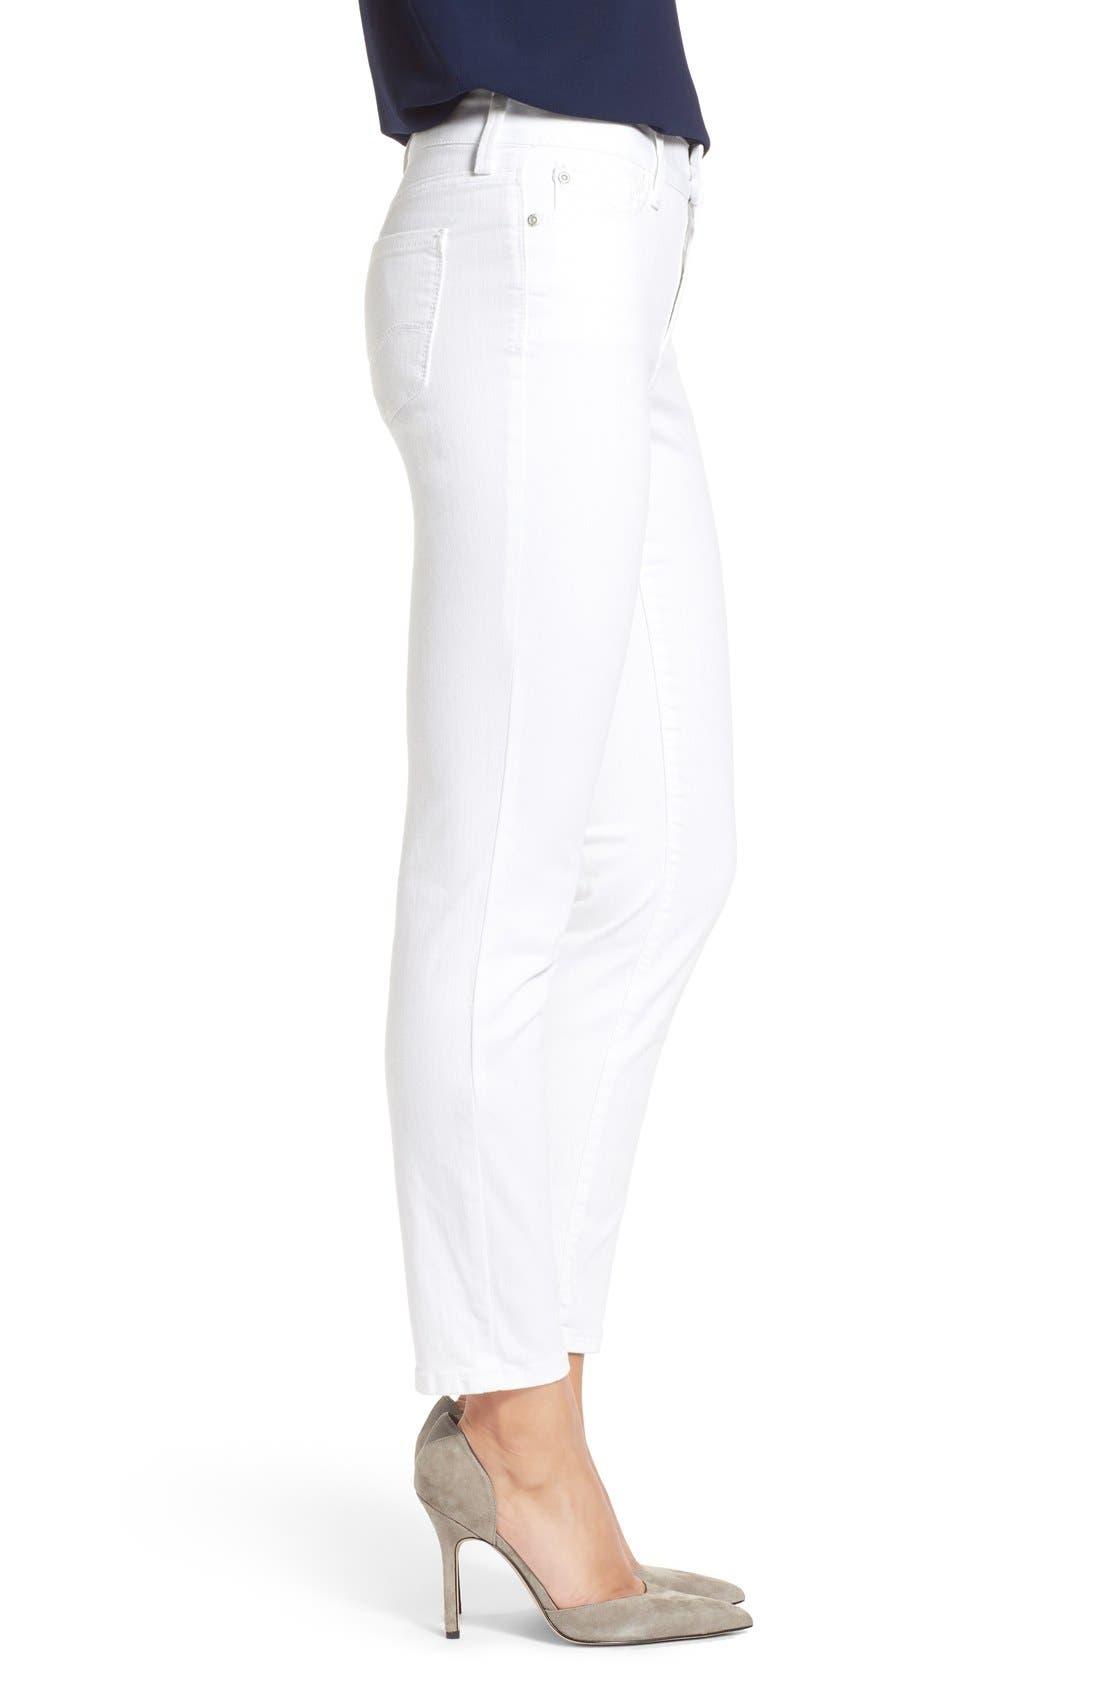 Alternate Image 3  - NYDJ Clarissa Colored Stretch Ankle Skinny Jeans (Regular & Petite)